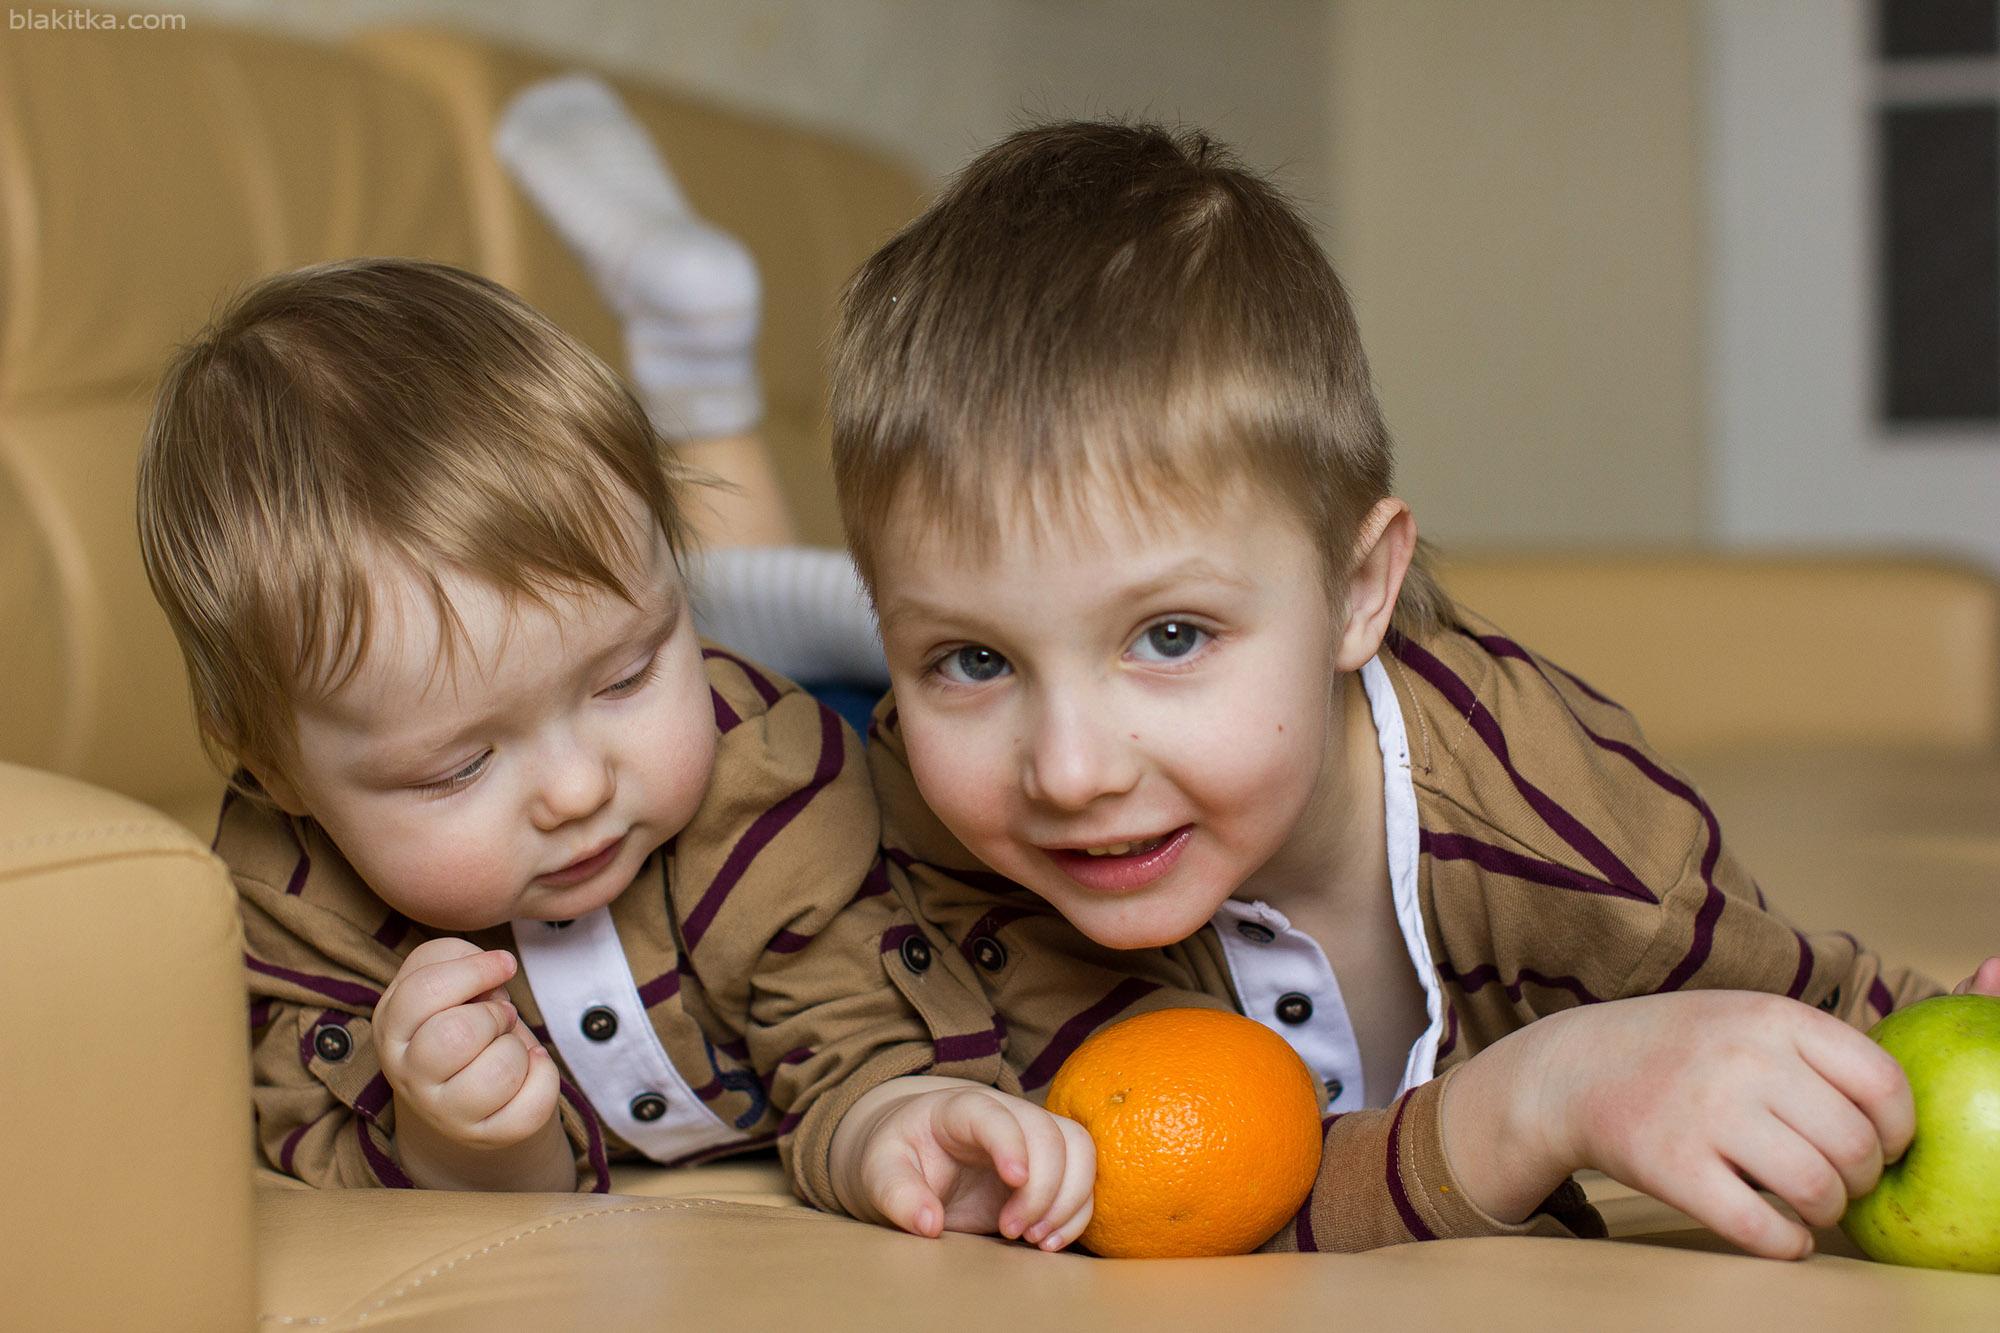 Two boys happy